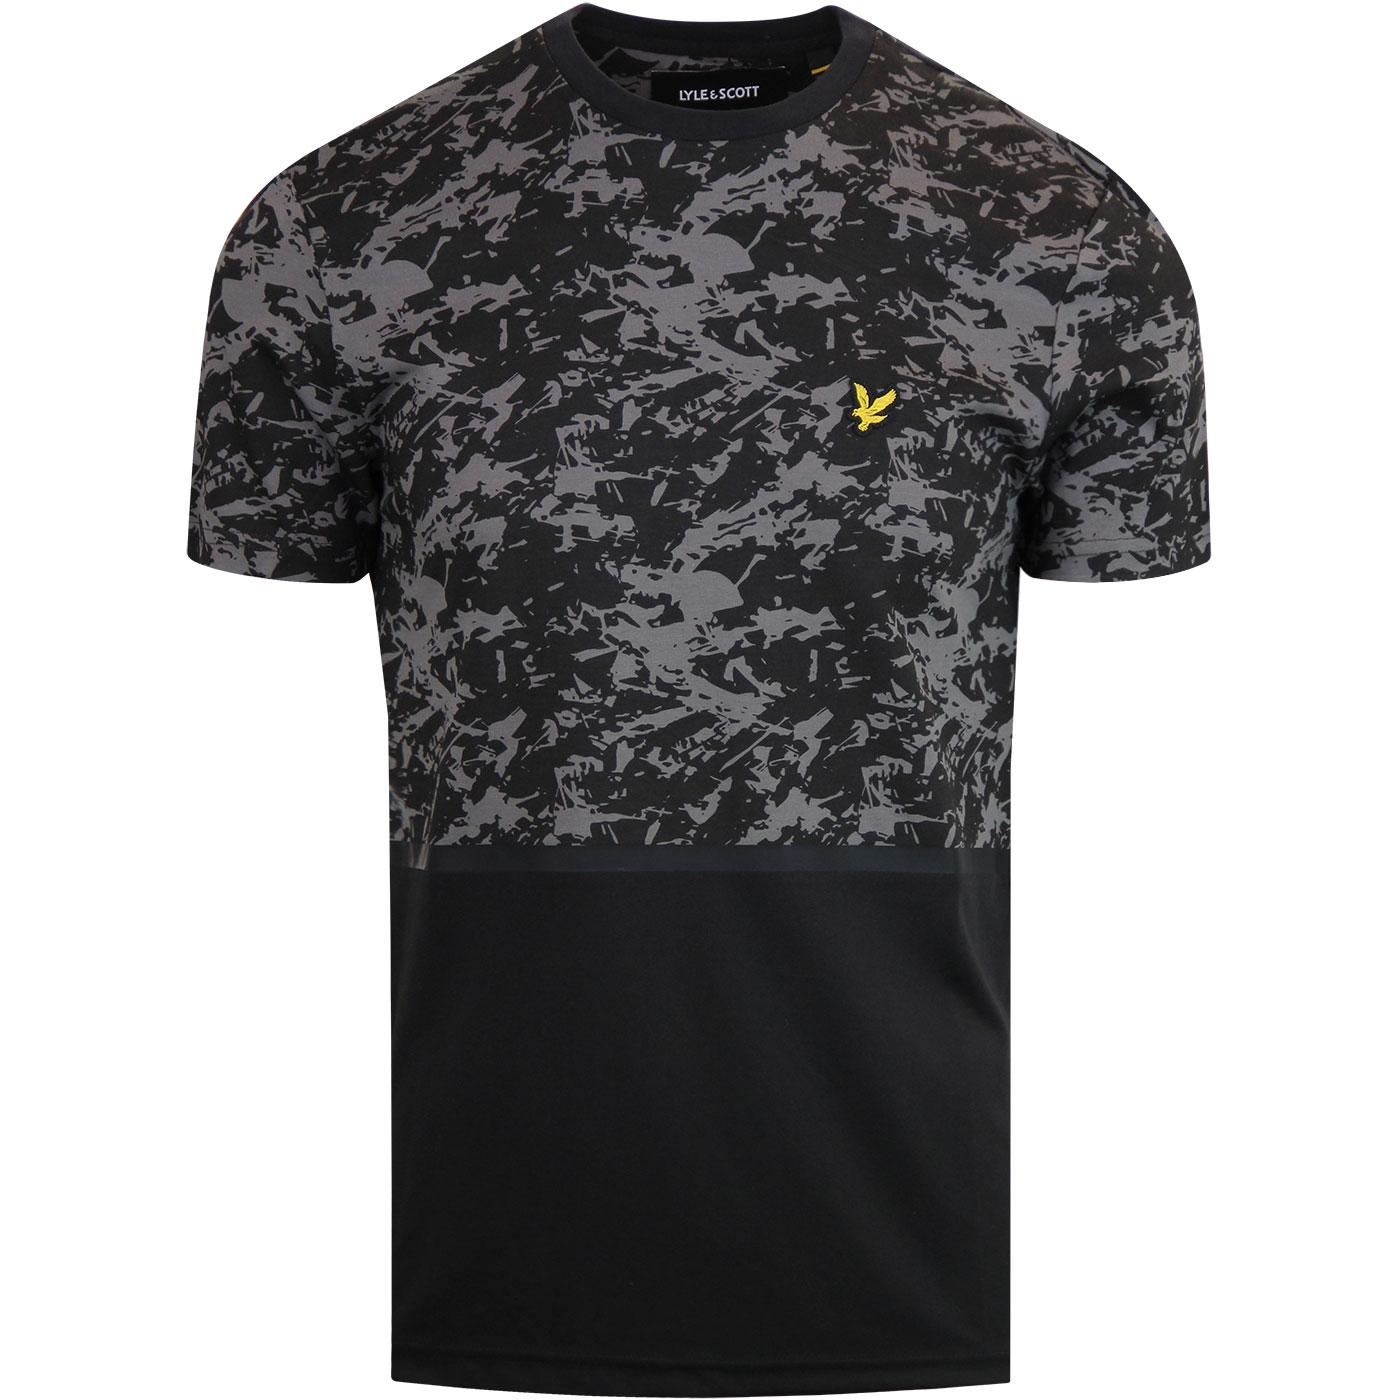 LYLE & SCOTT Casuals Camo Mens Retro Print T-shirt